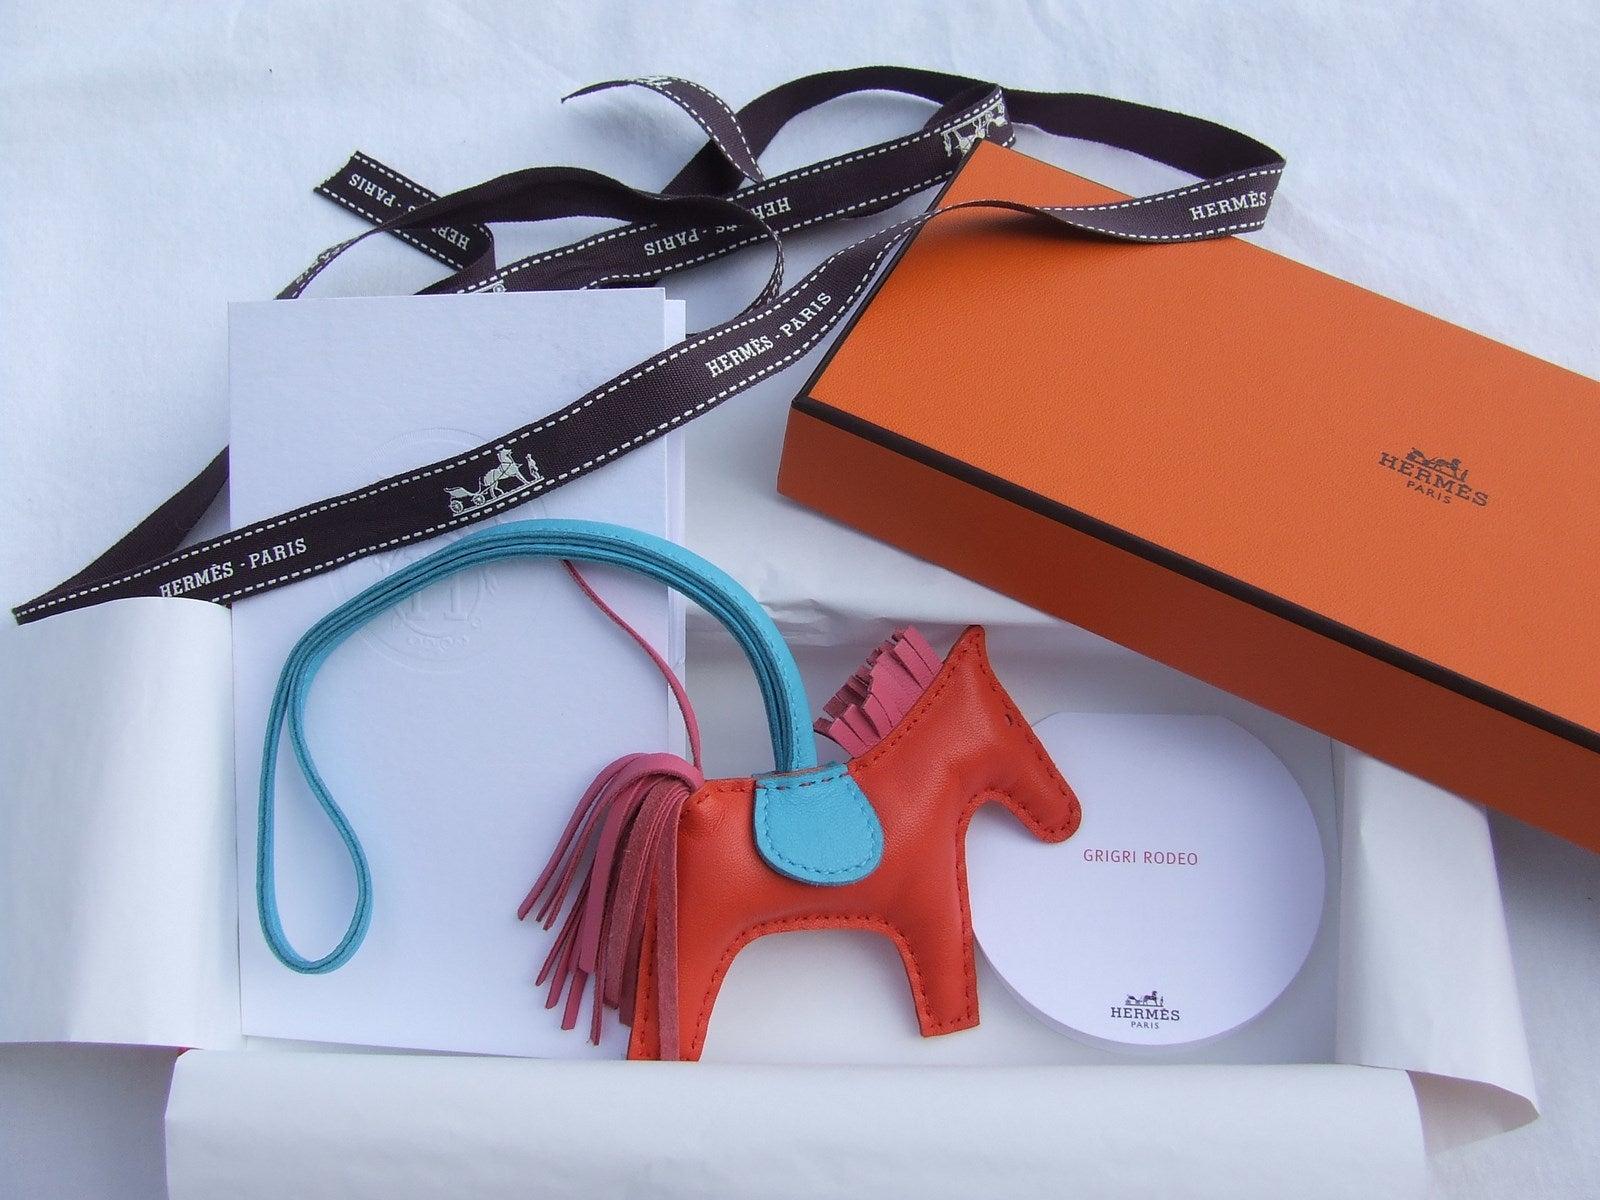 e6b1b47ffb Hermes Grigri Rodeo Horse Kelly Birkin Bag Charm Orange Rose Bleu PM at  1stdibs